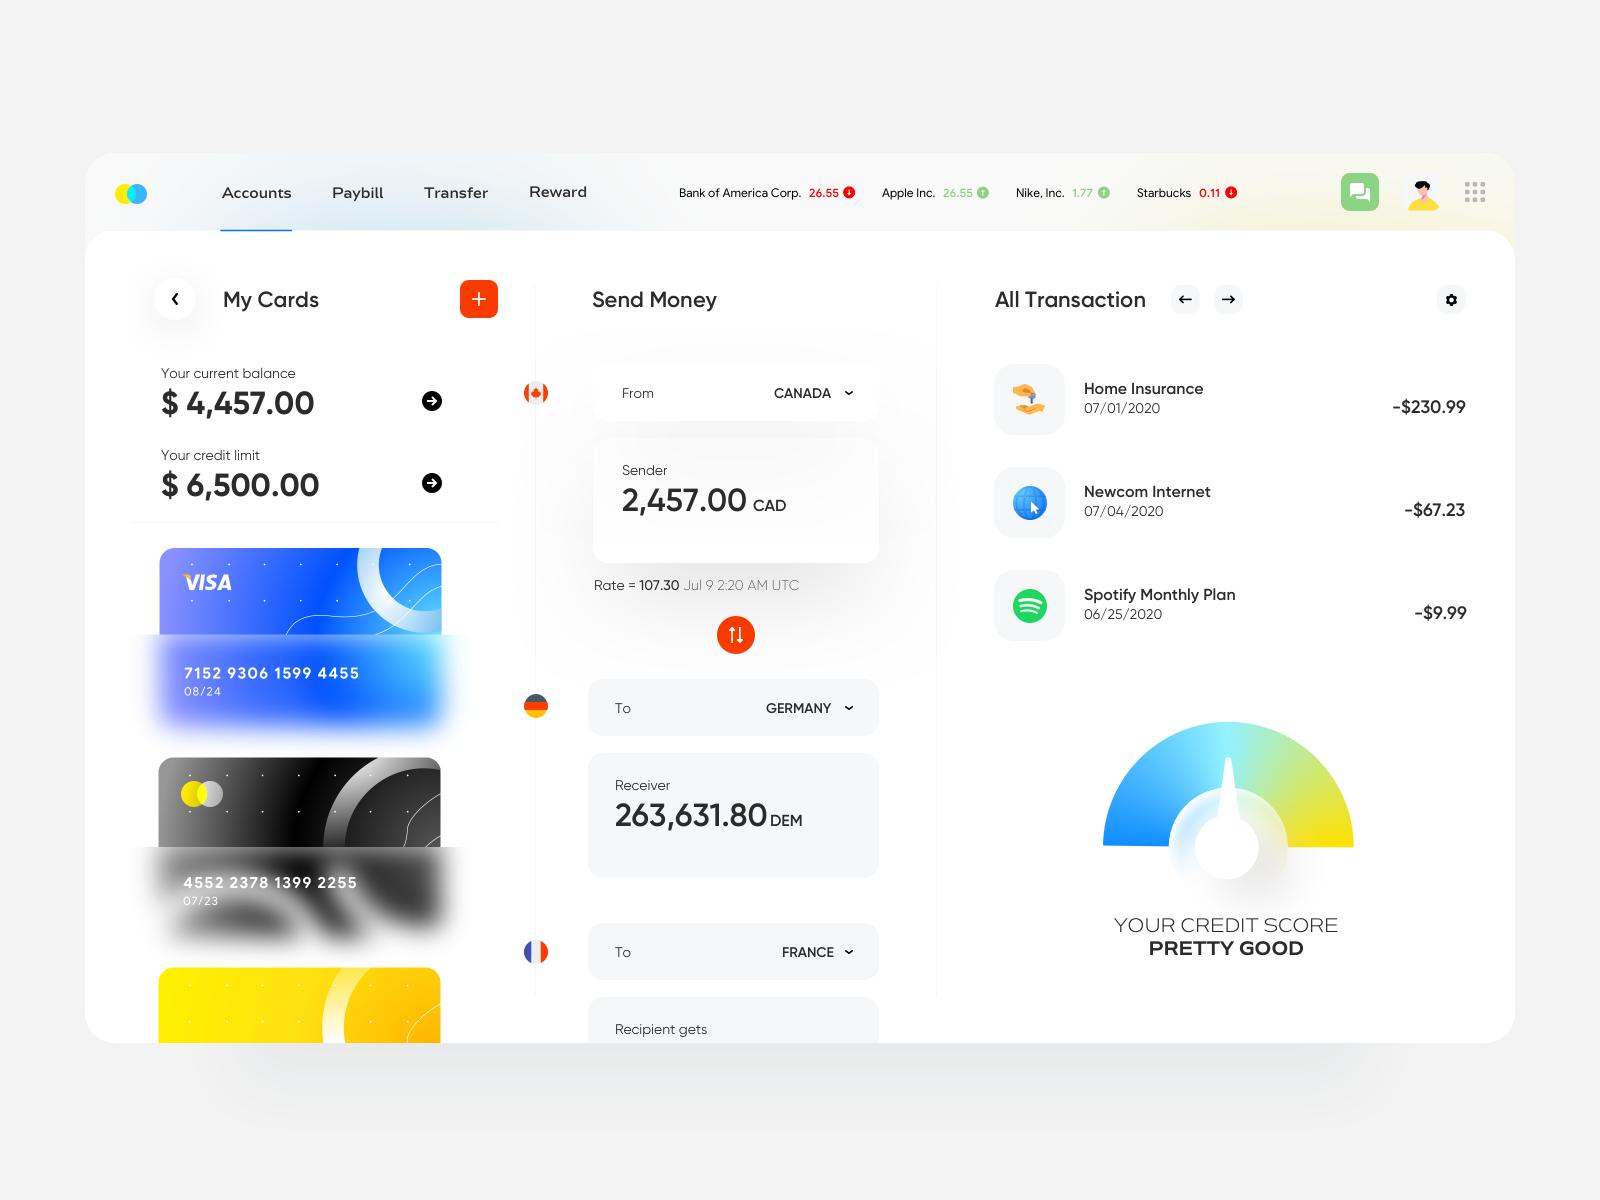 Online Banking Web App In 2020 Web App Dashboard Design Web App Design